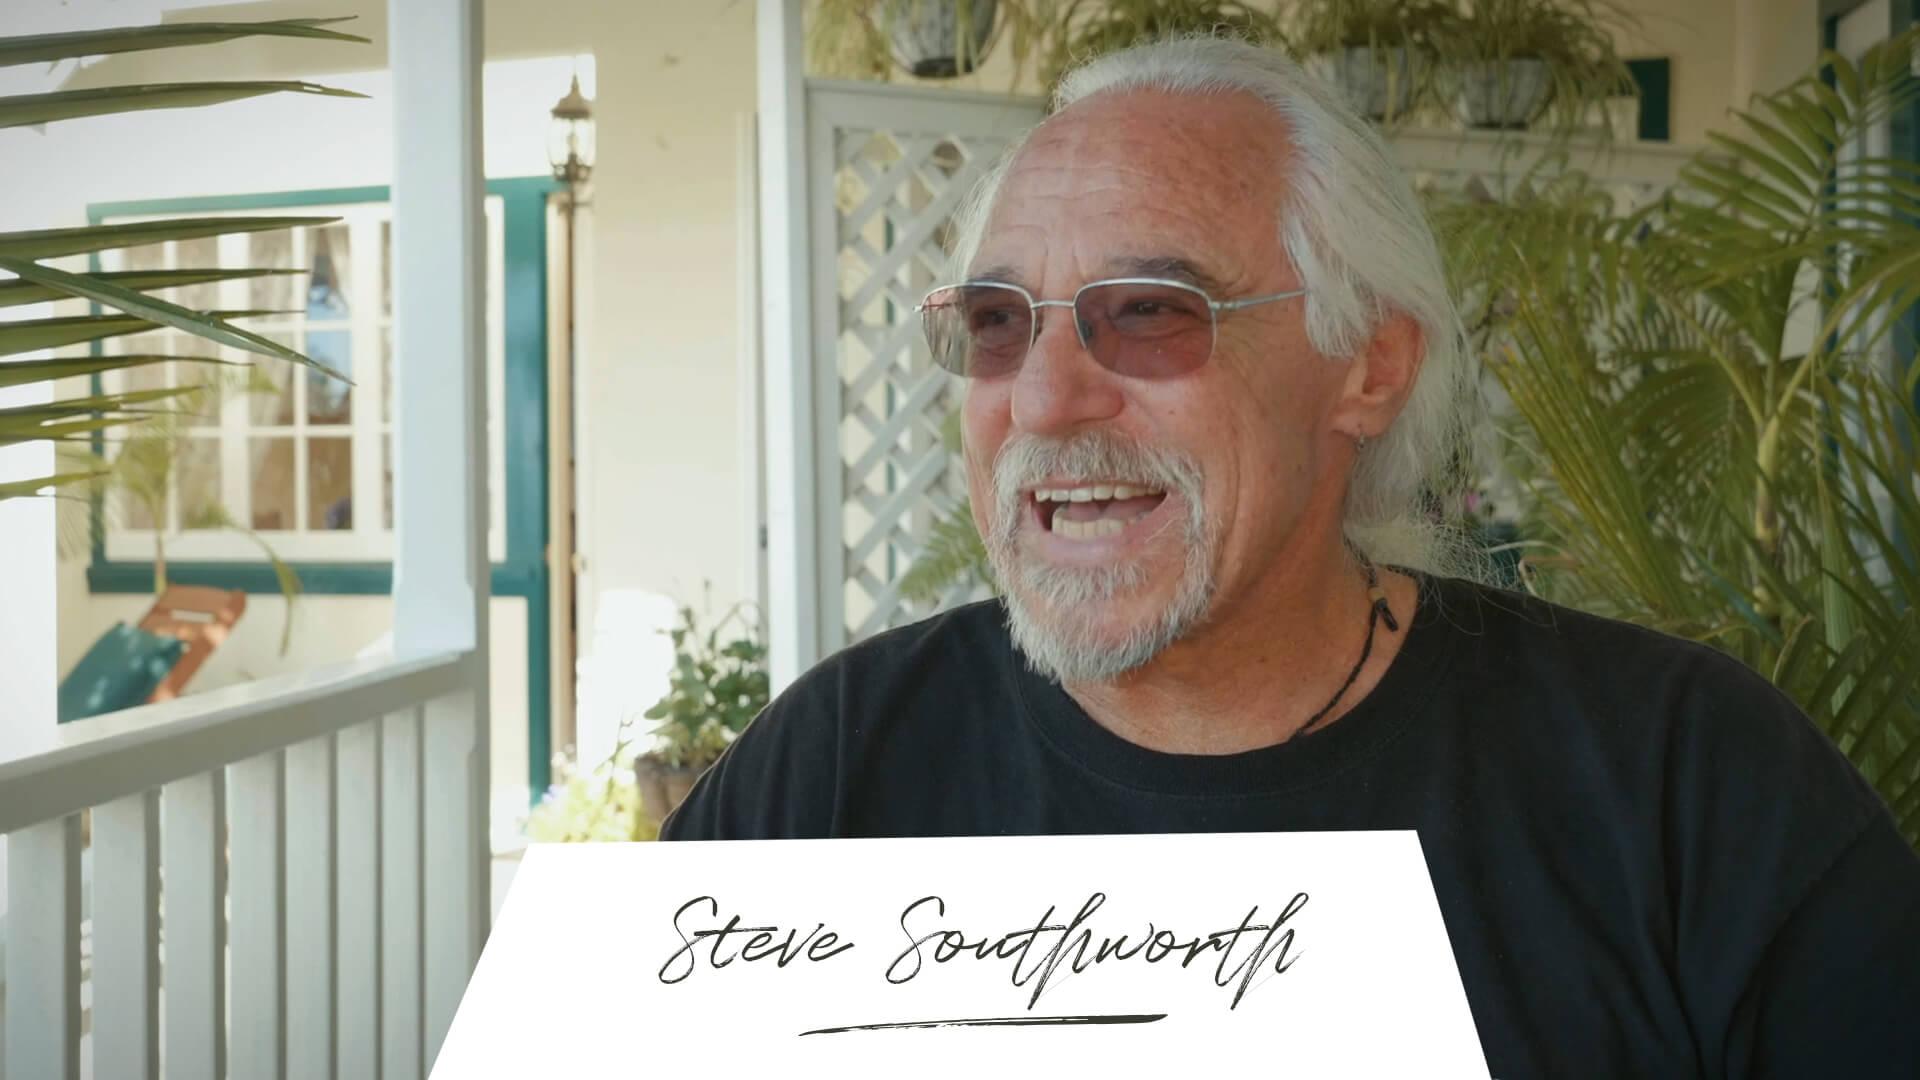 Where is now? Steve Southworth Wegbegleiter